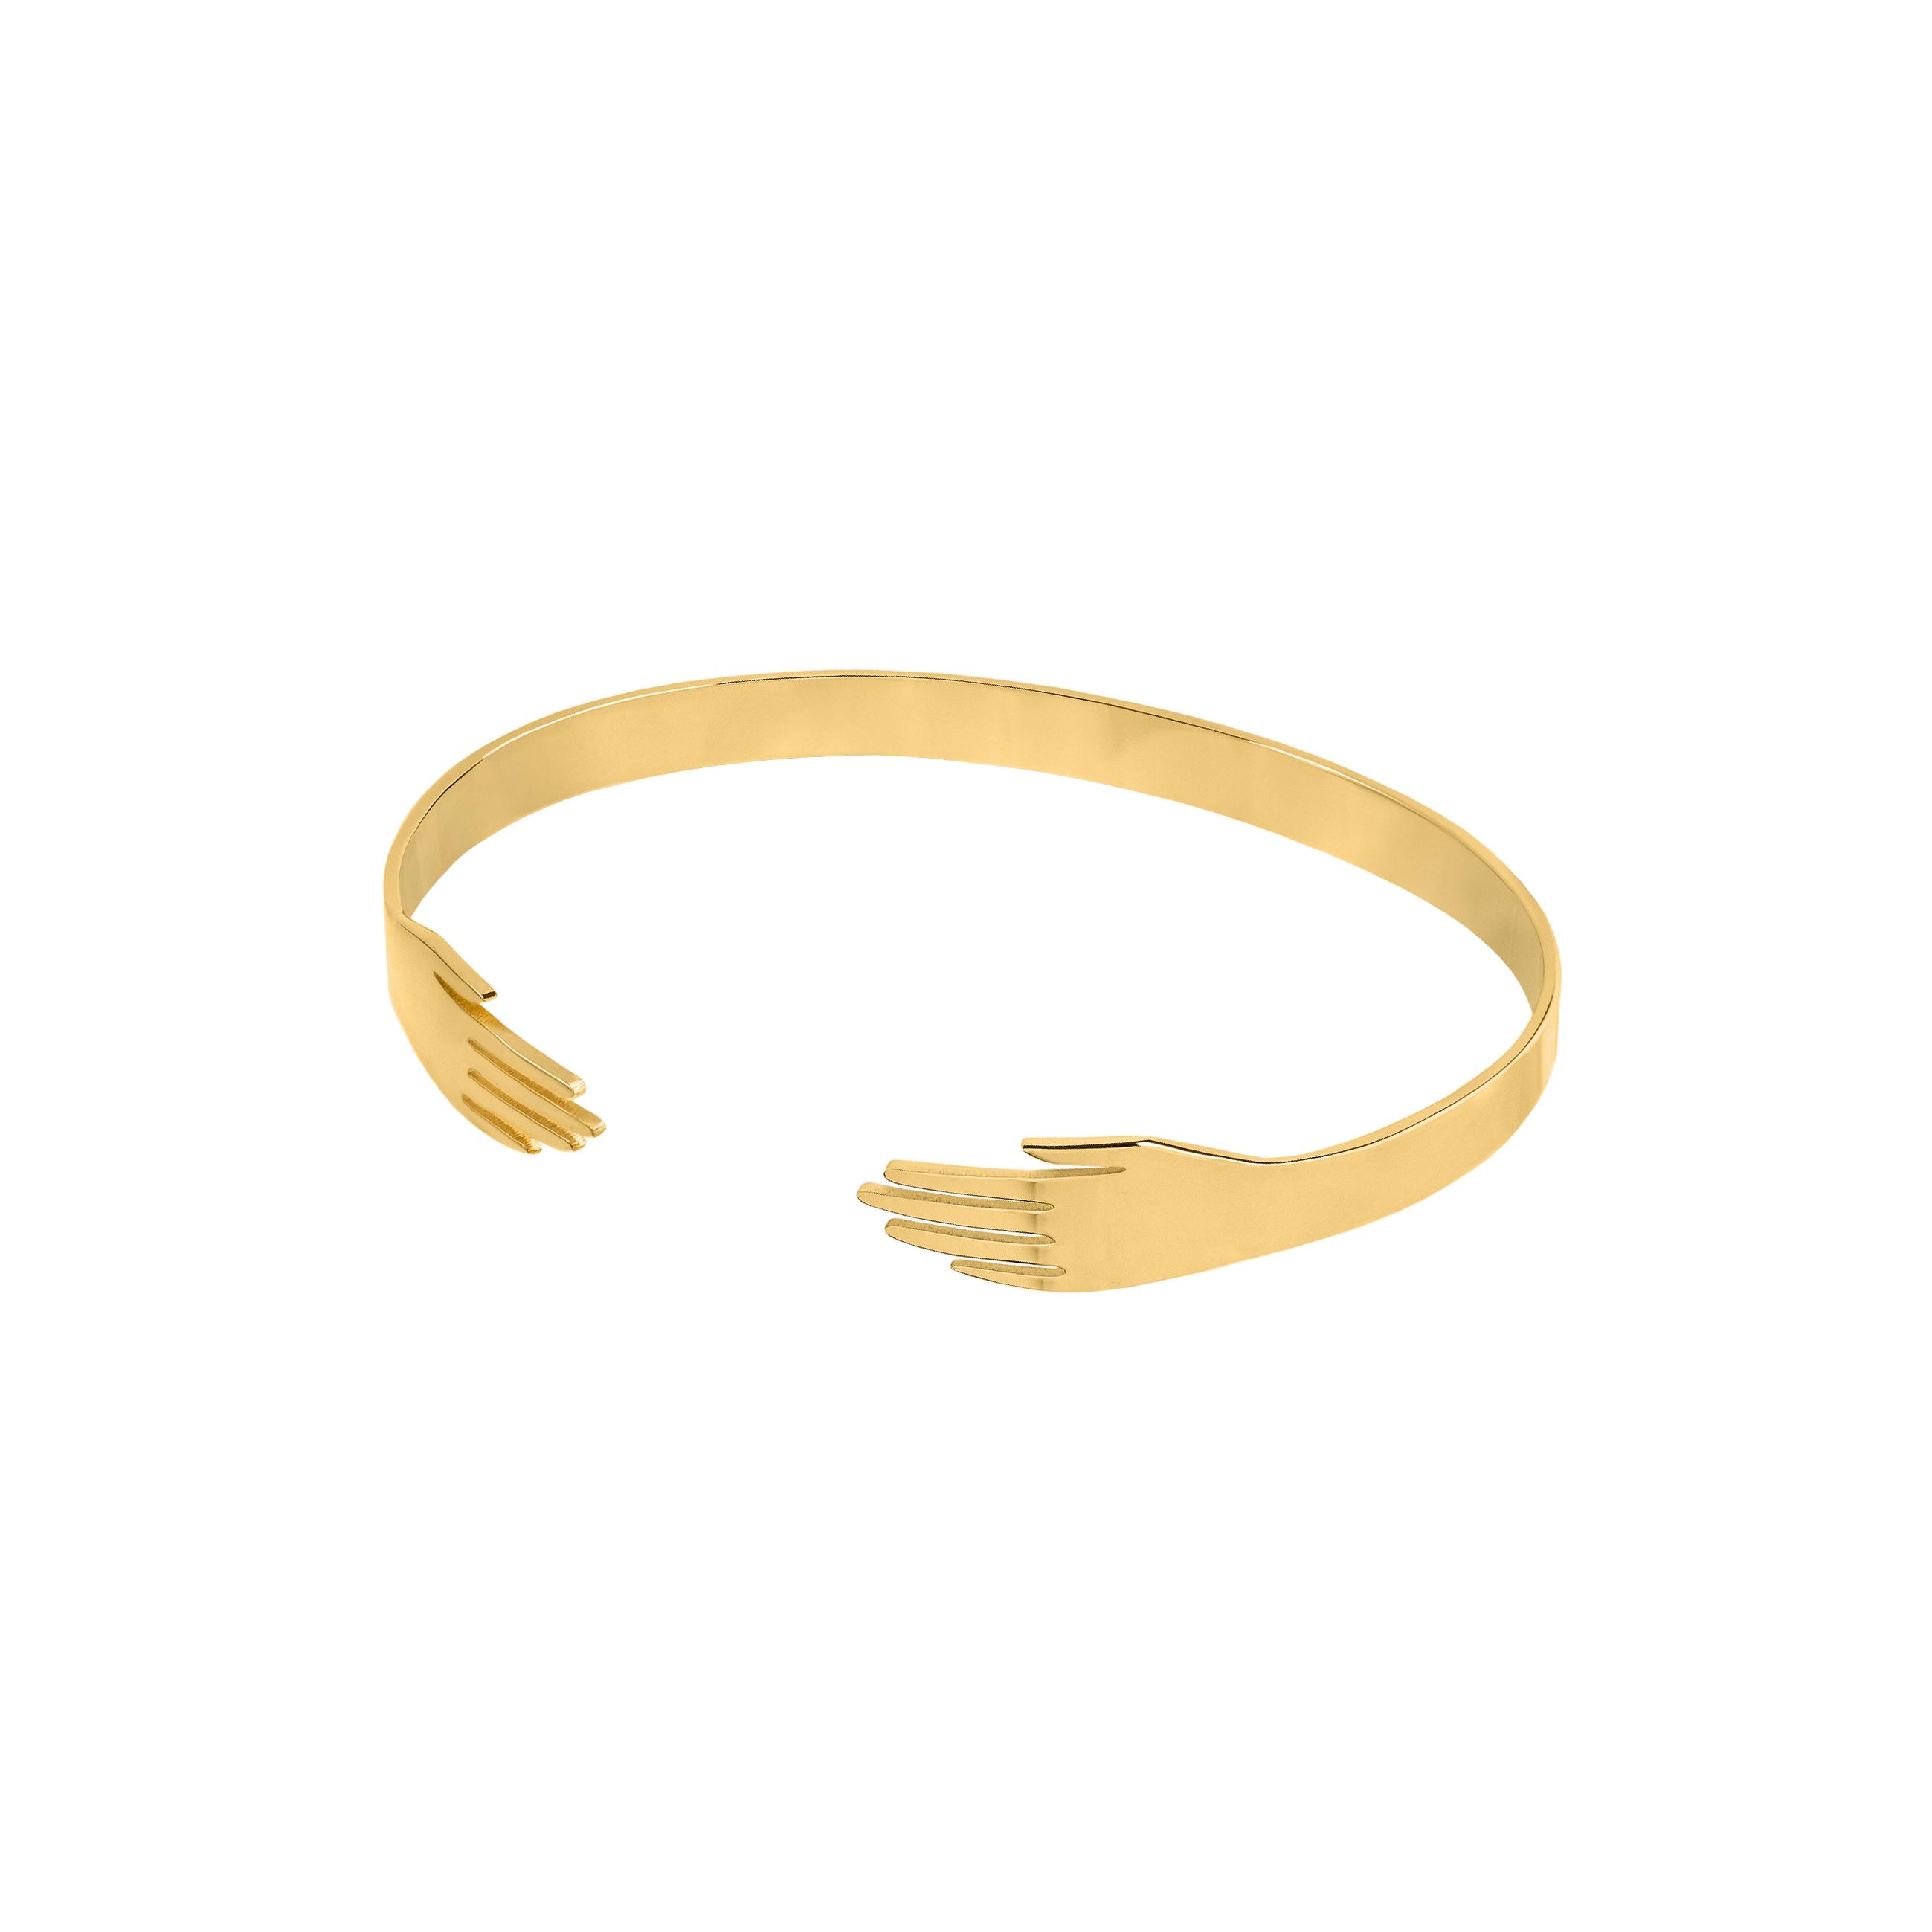 HAND BRACELET- GOLD